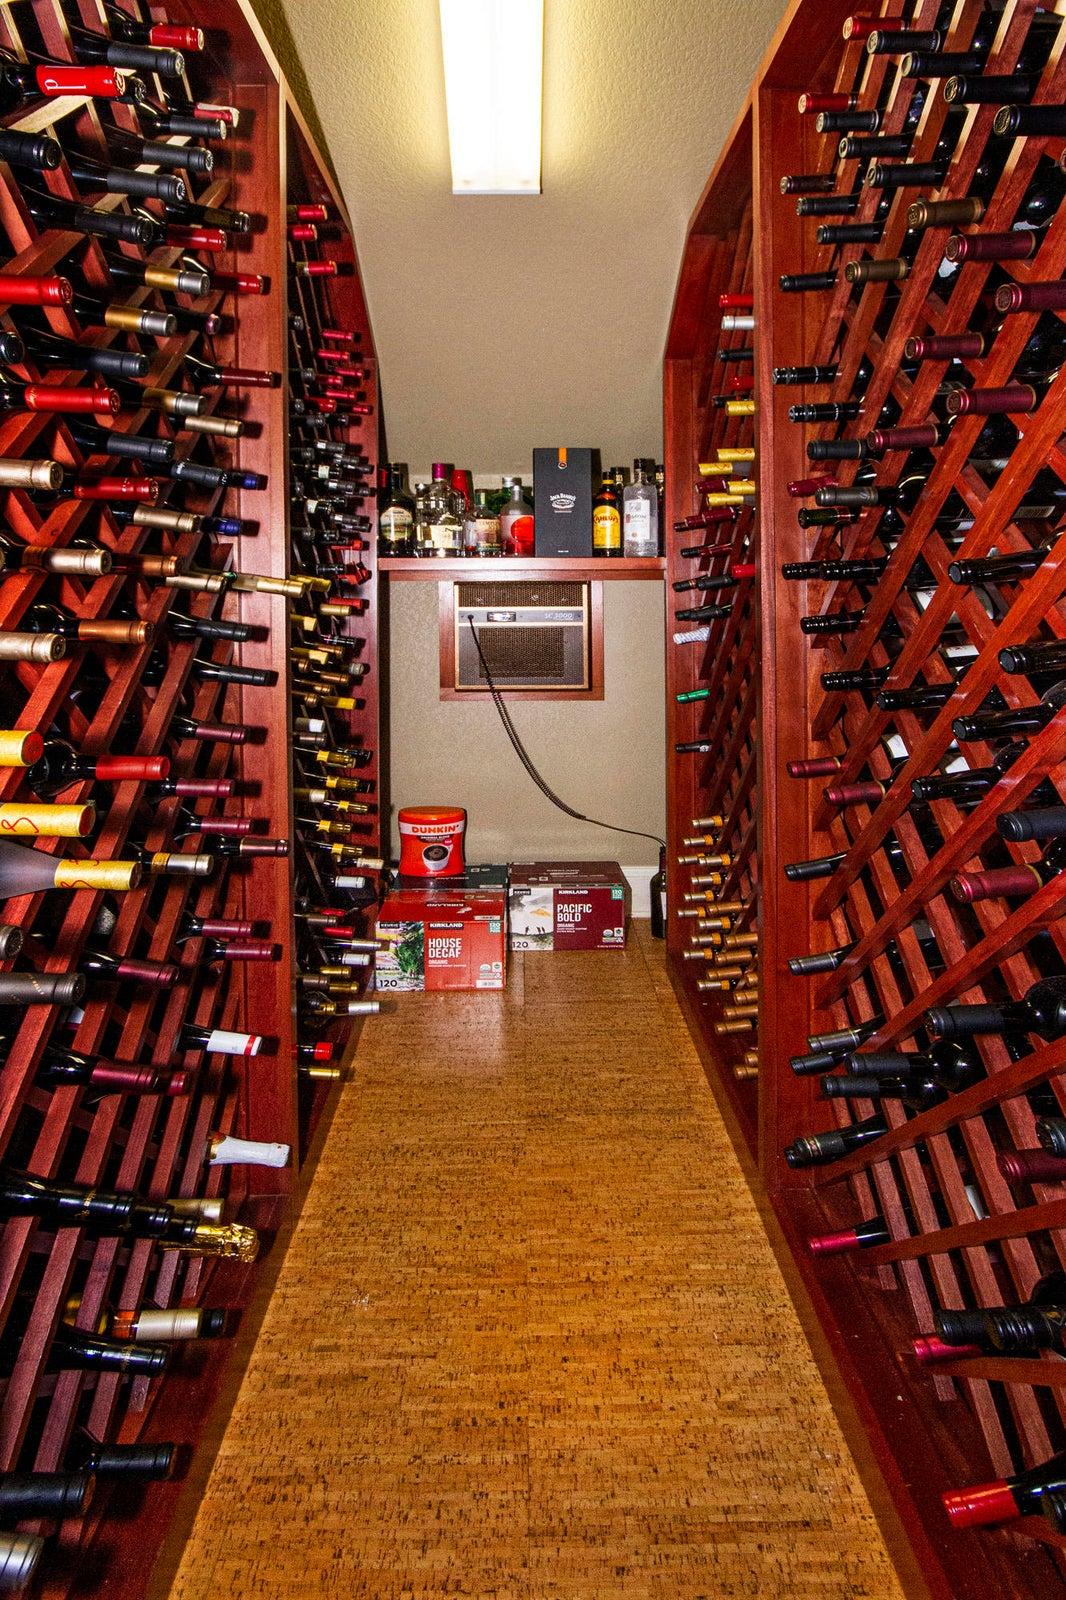 500 Bottle Refrigerated Wine Cellar!